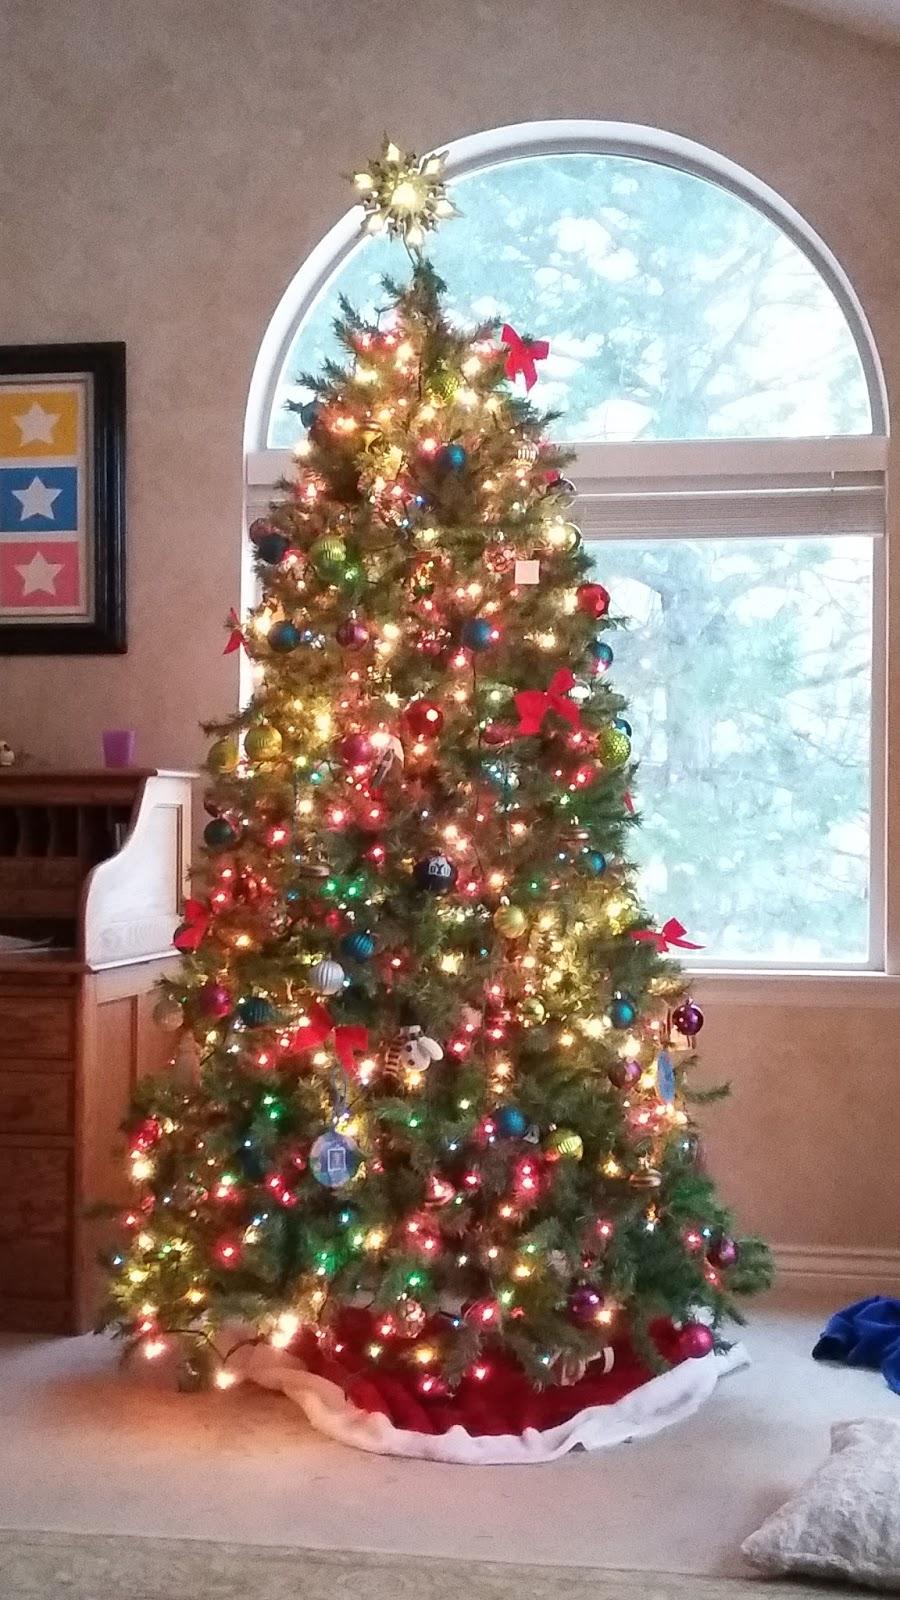 90s Christmas Tree.Our Life With 12 Kids Christmas Trees